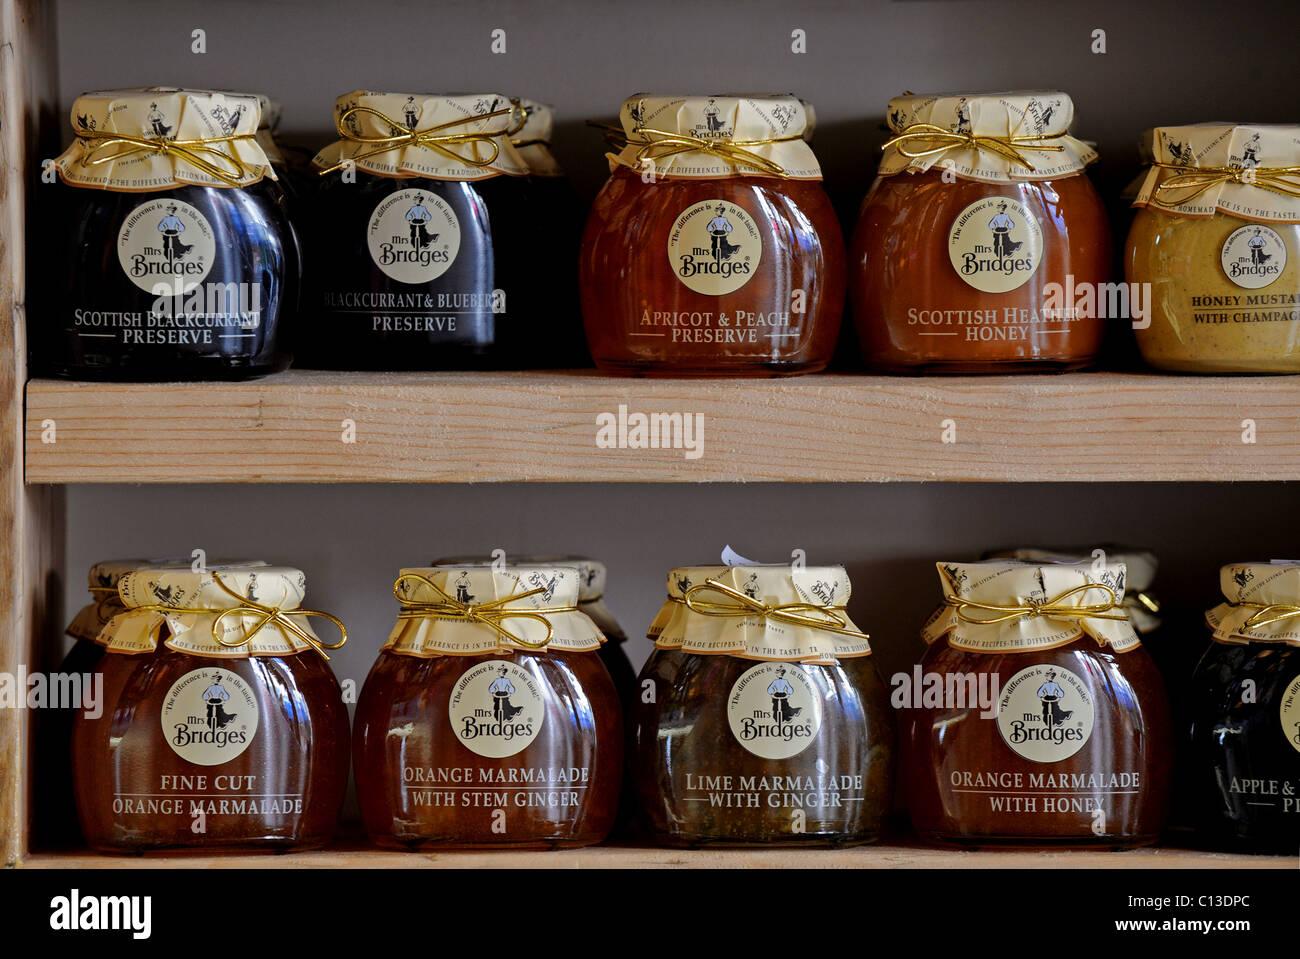 Shelves of Mrs Bridges marmalades and jams on display in Artisan delicatessen - Stock Image